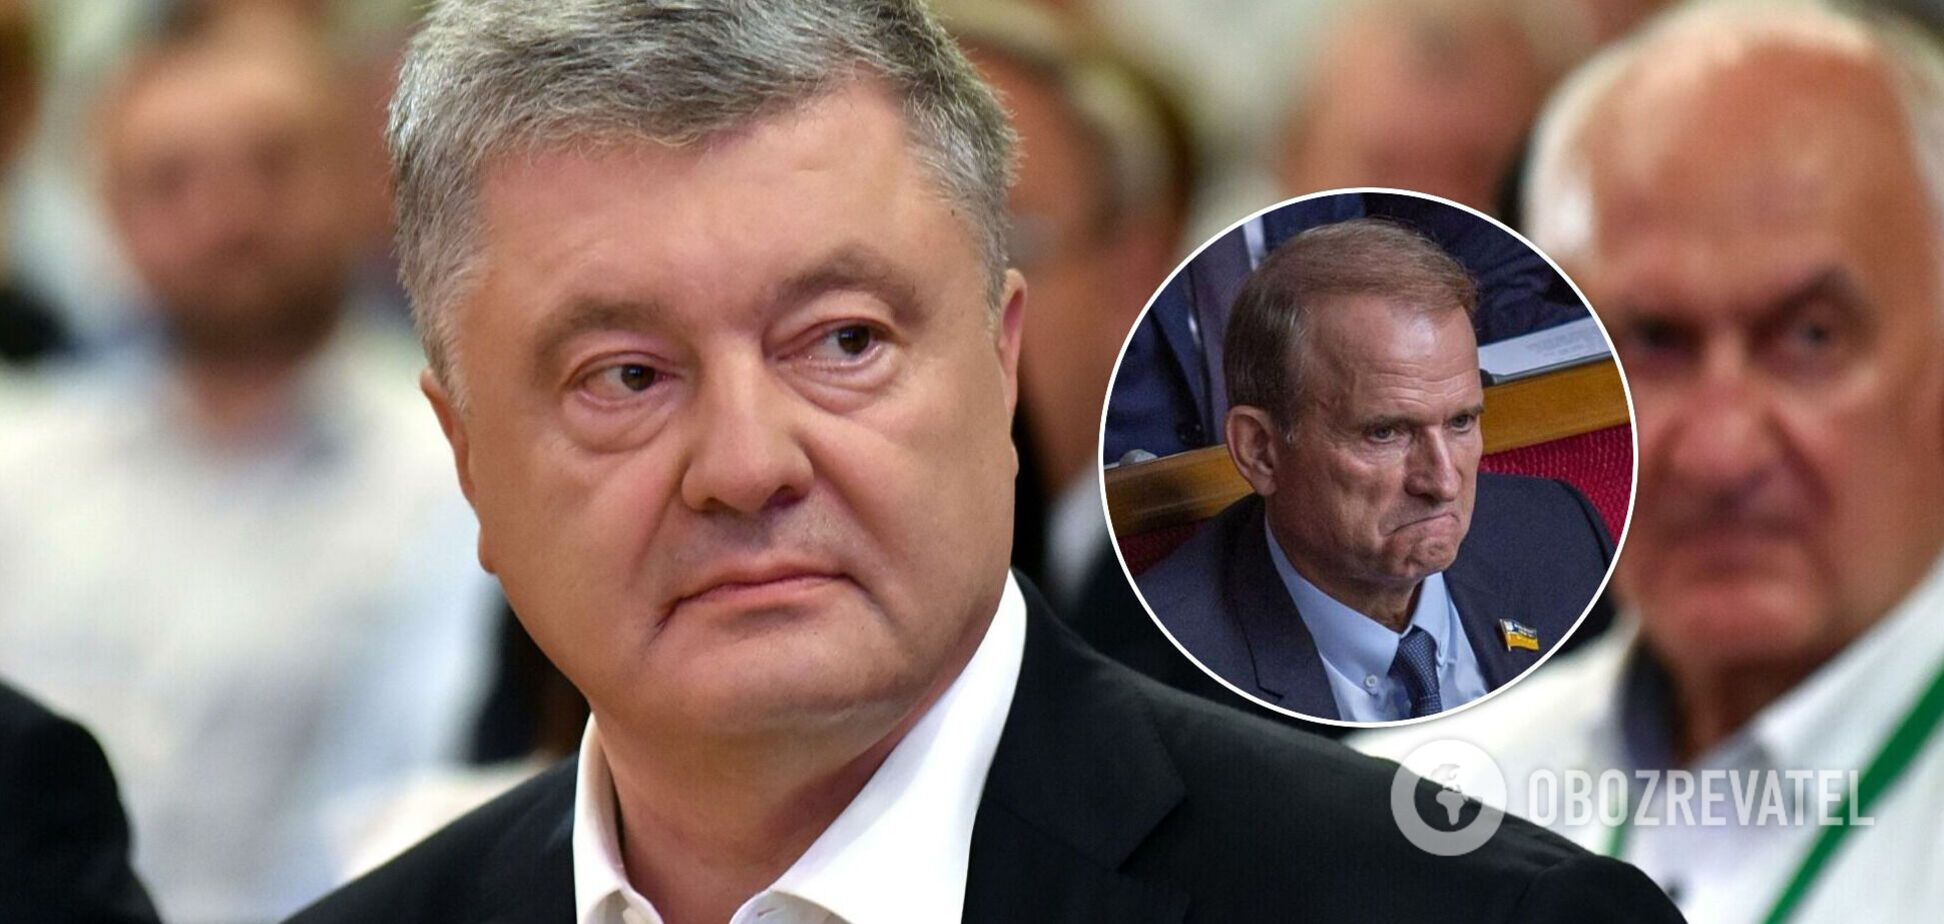 Ар'єв: справу про держзраду Медведчука почали ще за Порошенка